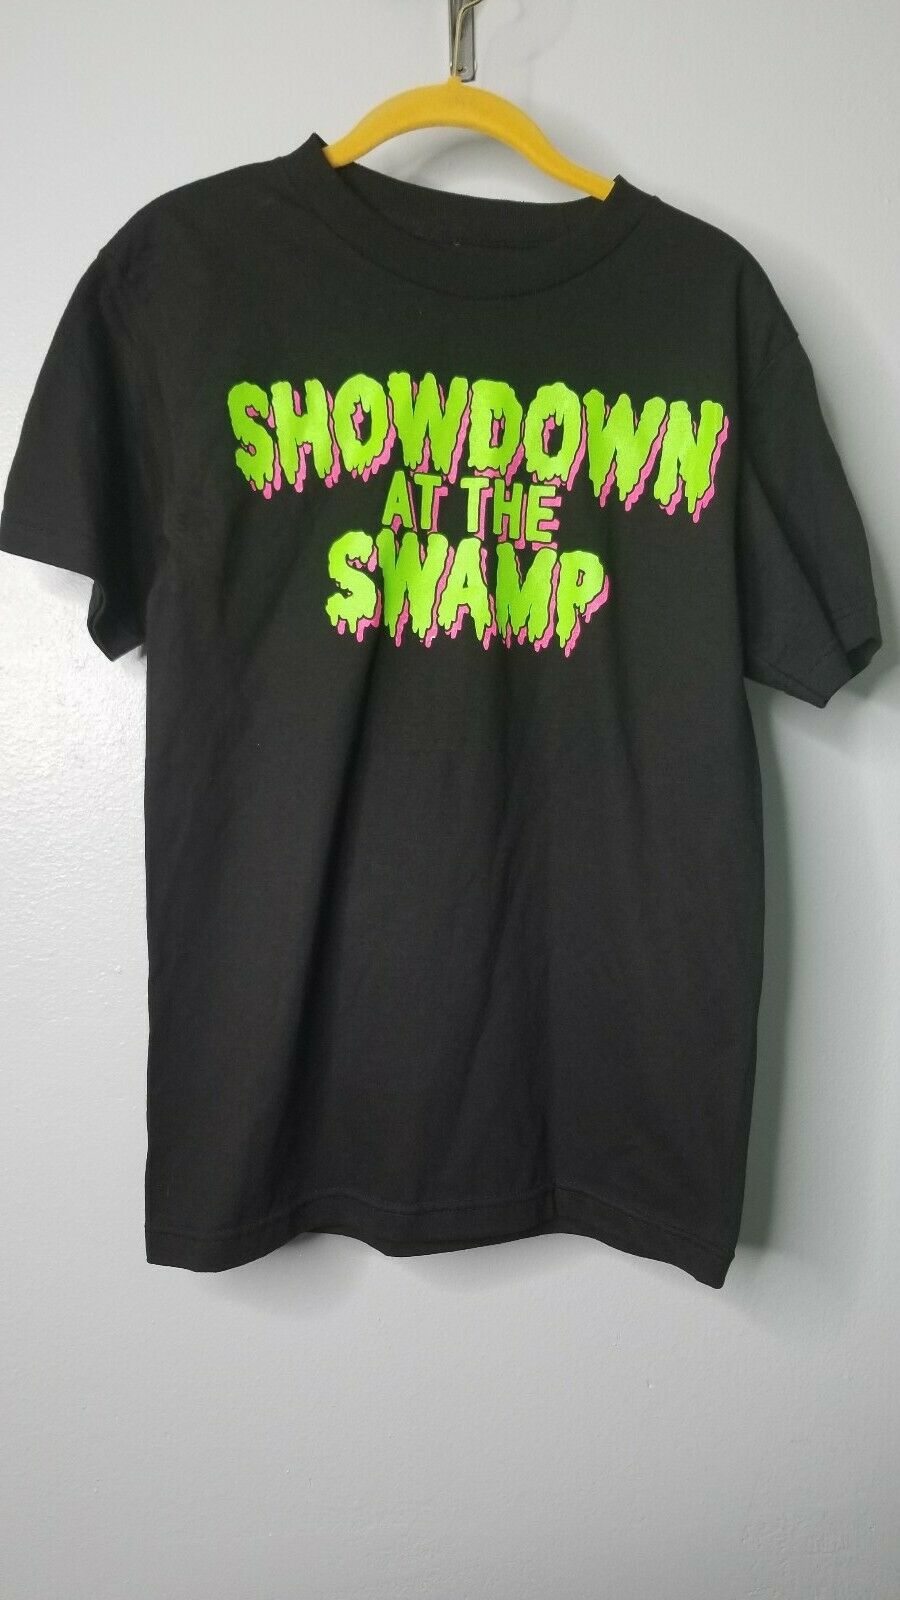 wwe southpaw regional wrestling malibu al s car emporium trucker hat for sale online ebay mens s wwe showdown at the swamp t shirt southpaw regional wrestling